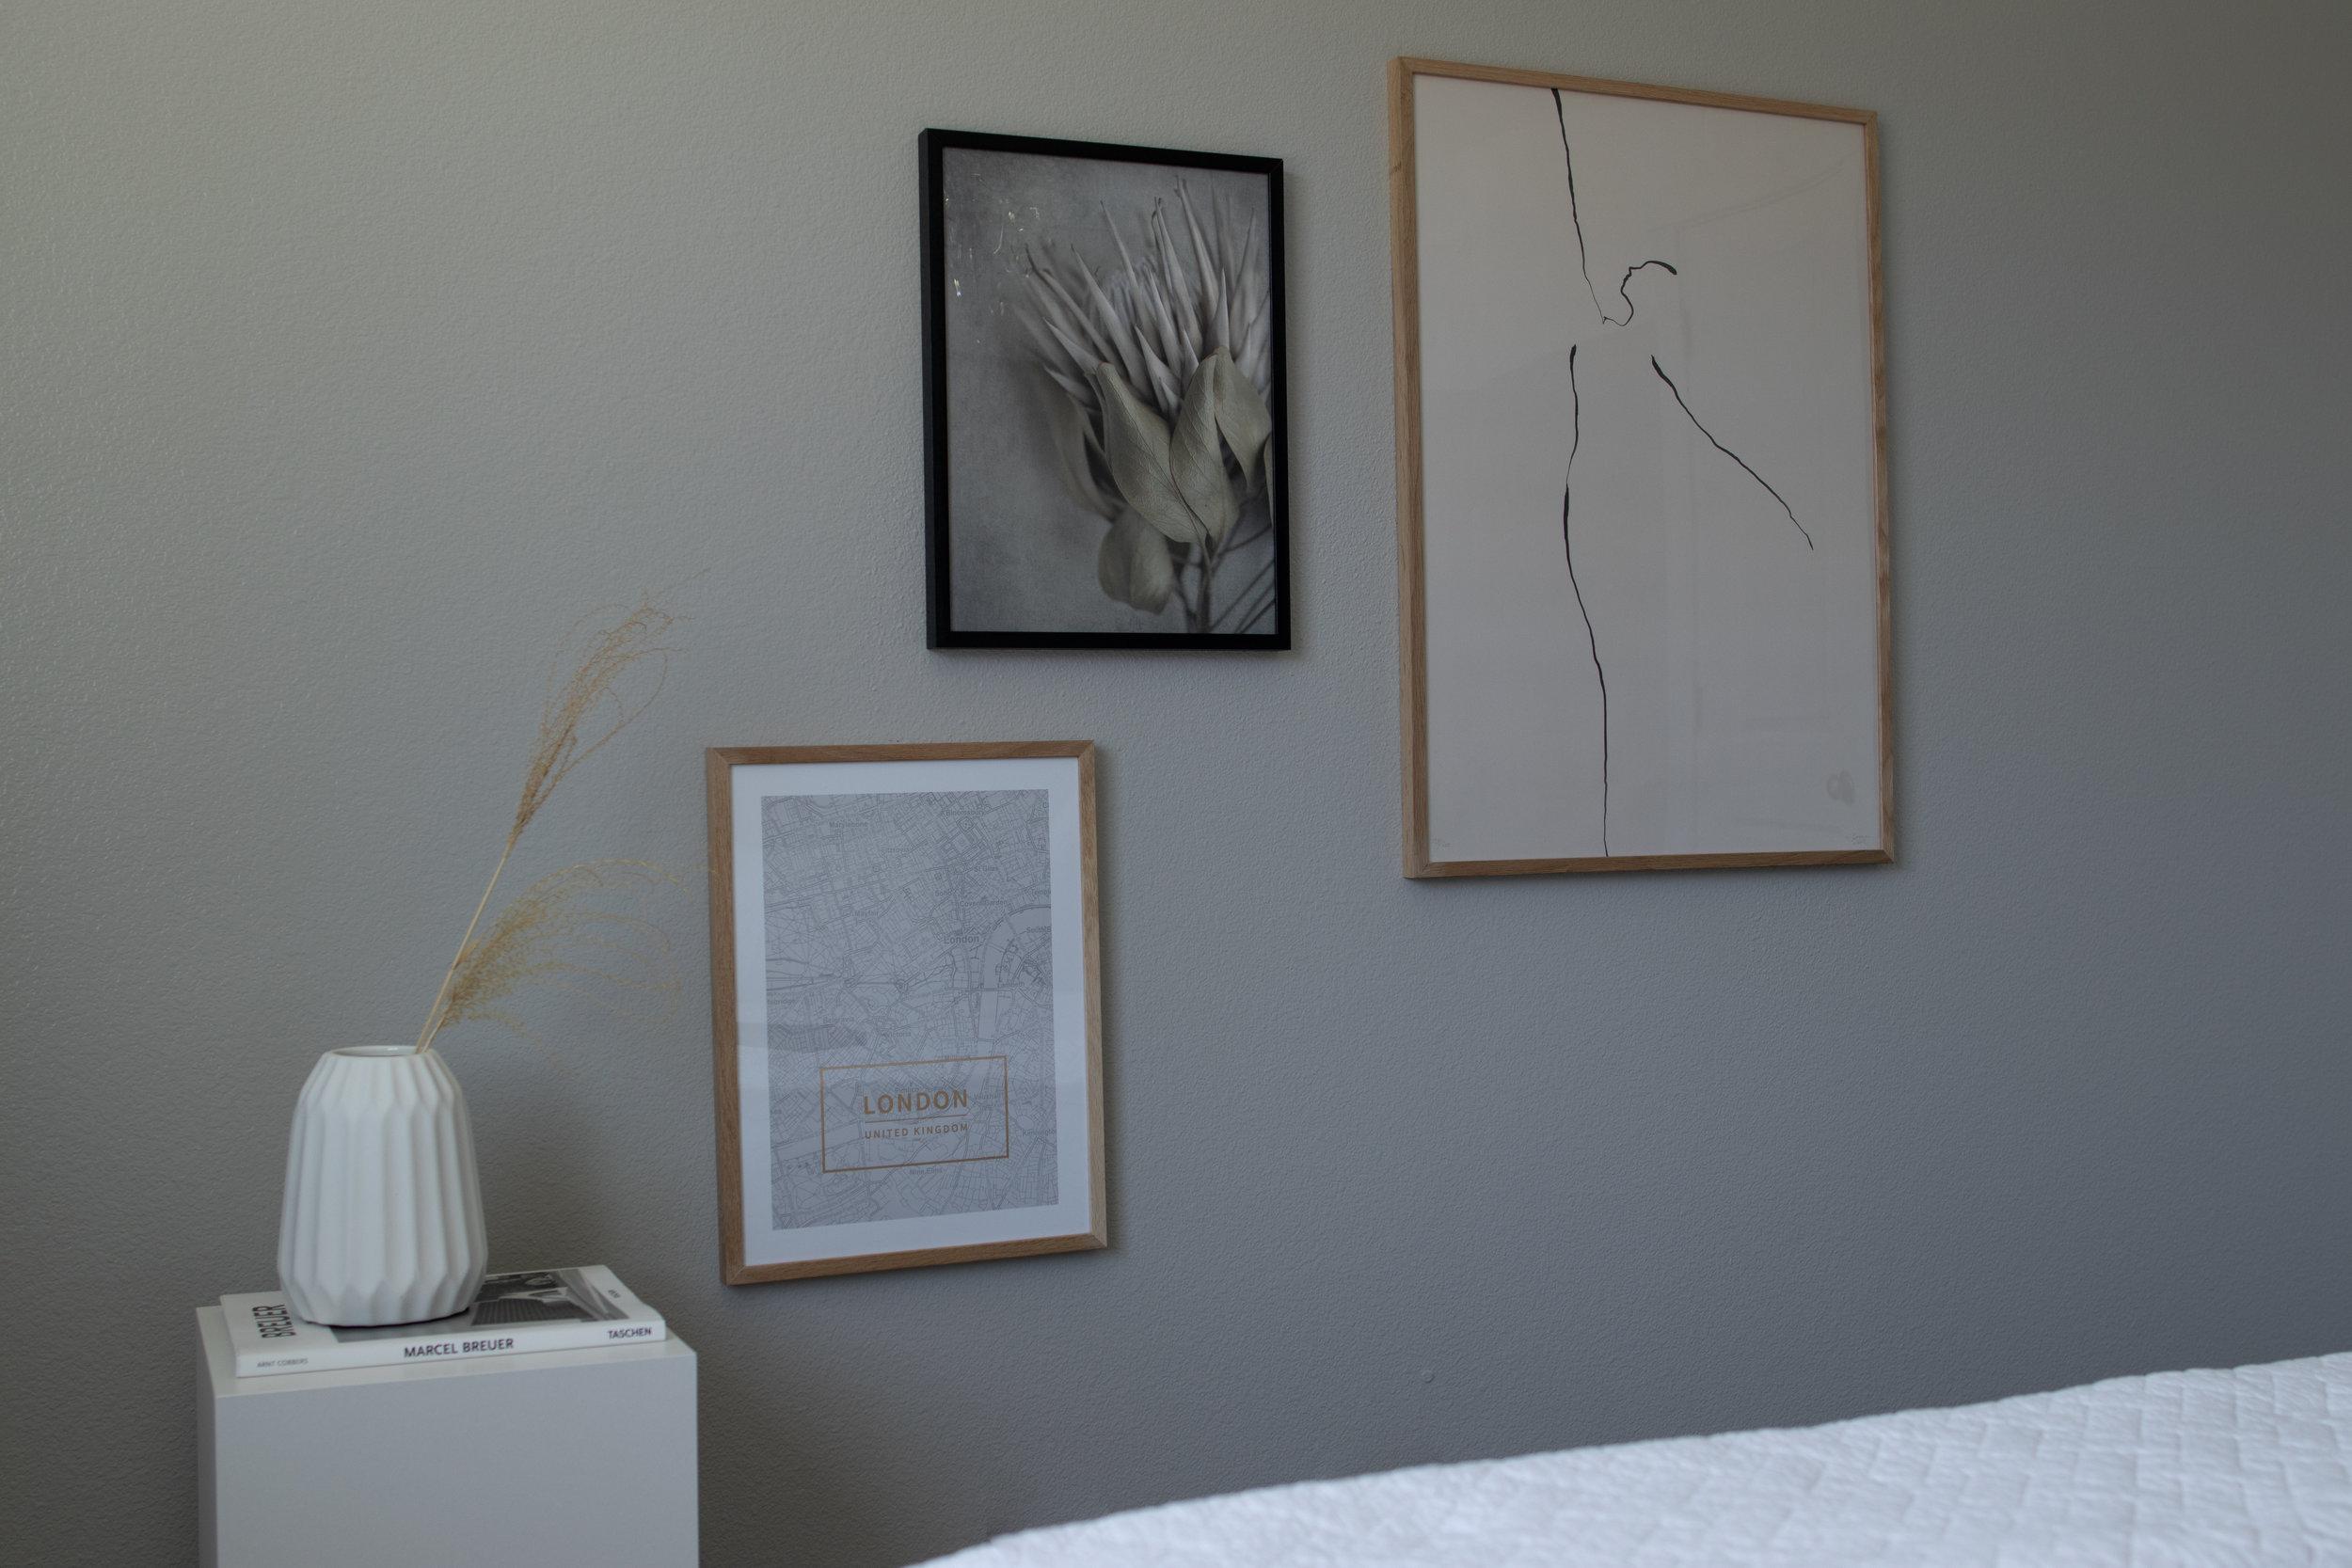 Art Wall in a Minimalist Bedroom